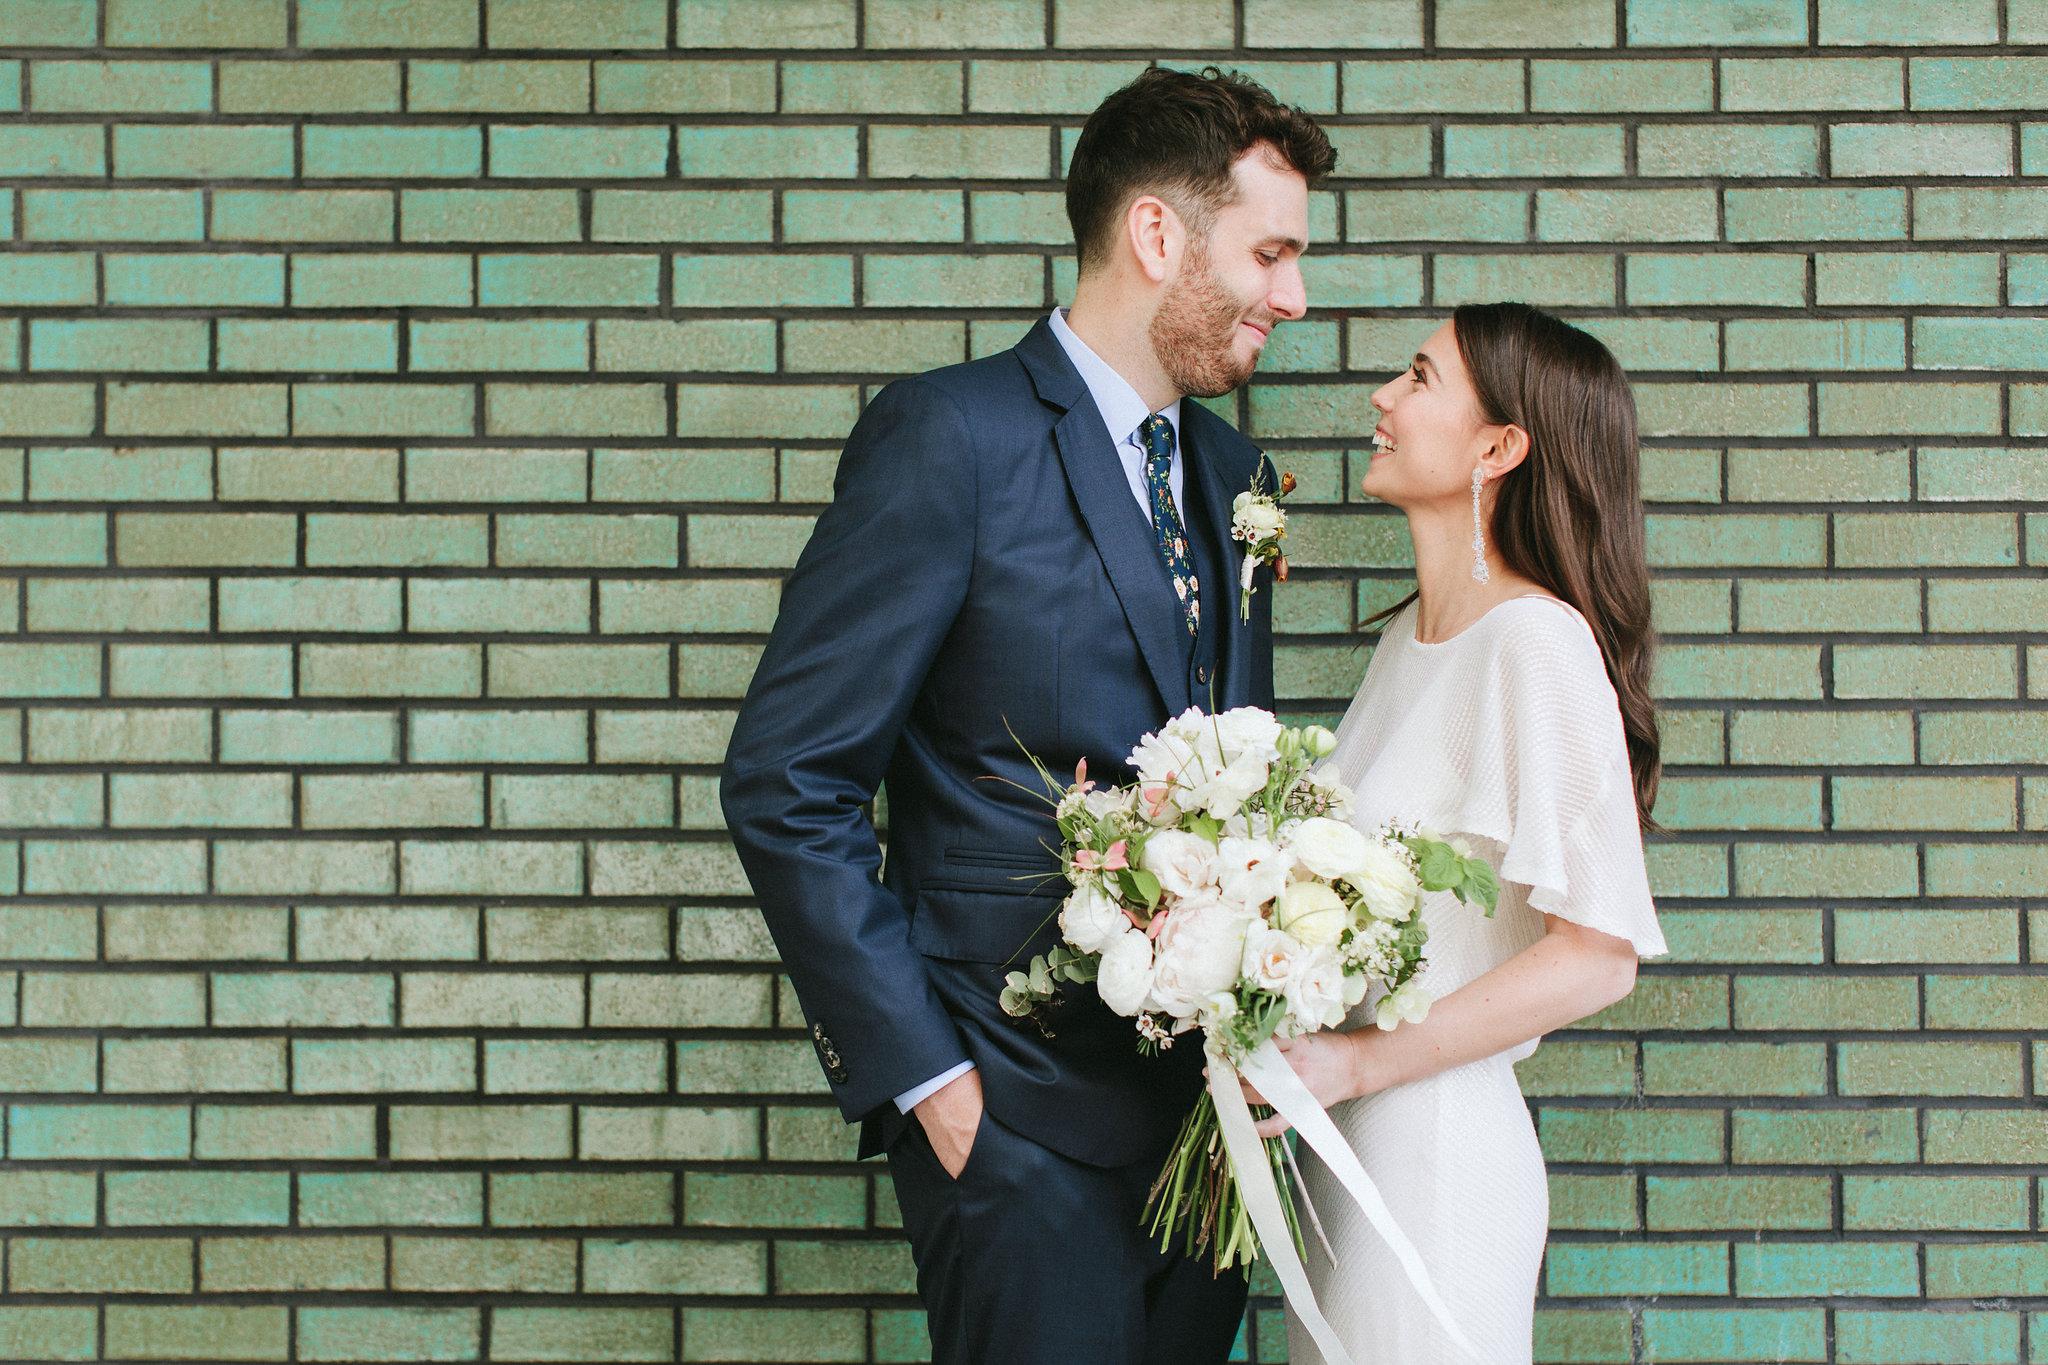 bowery-hotel-wedding-jove-meyer-events-029.jpg